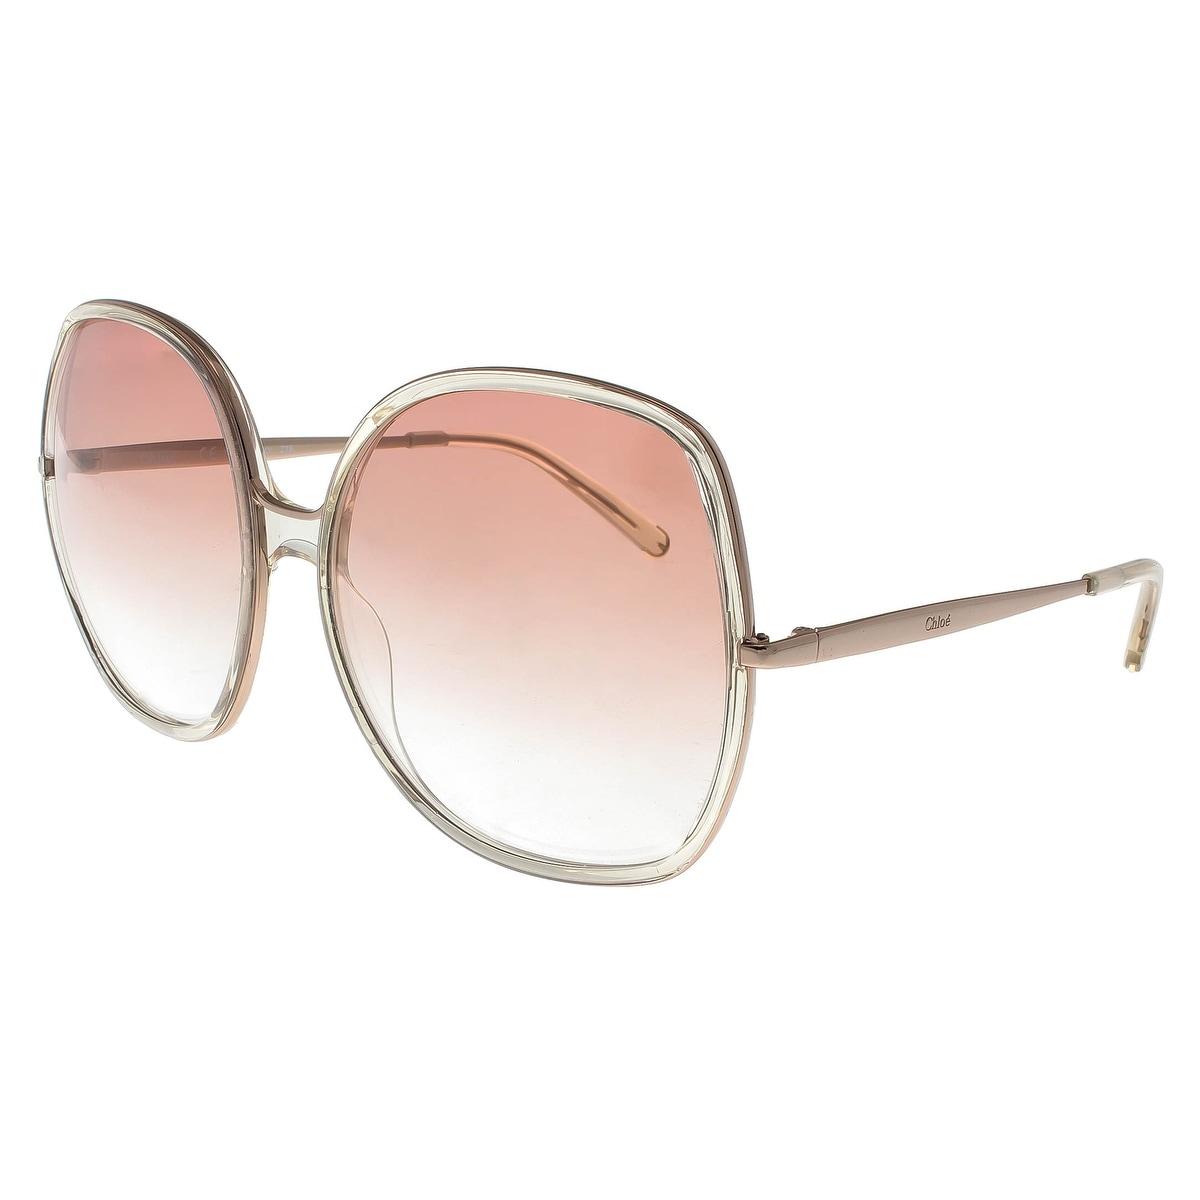 3bb64390eb33 Chloe Sunglasses